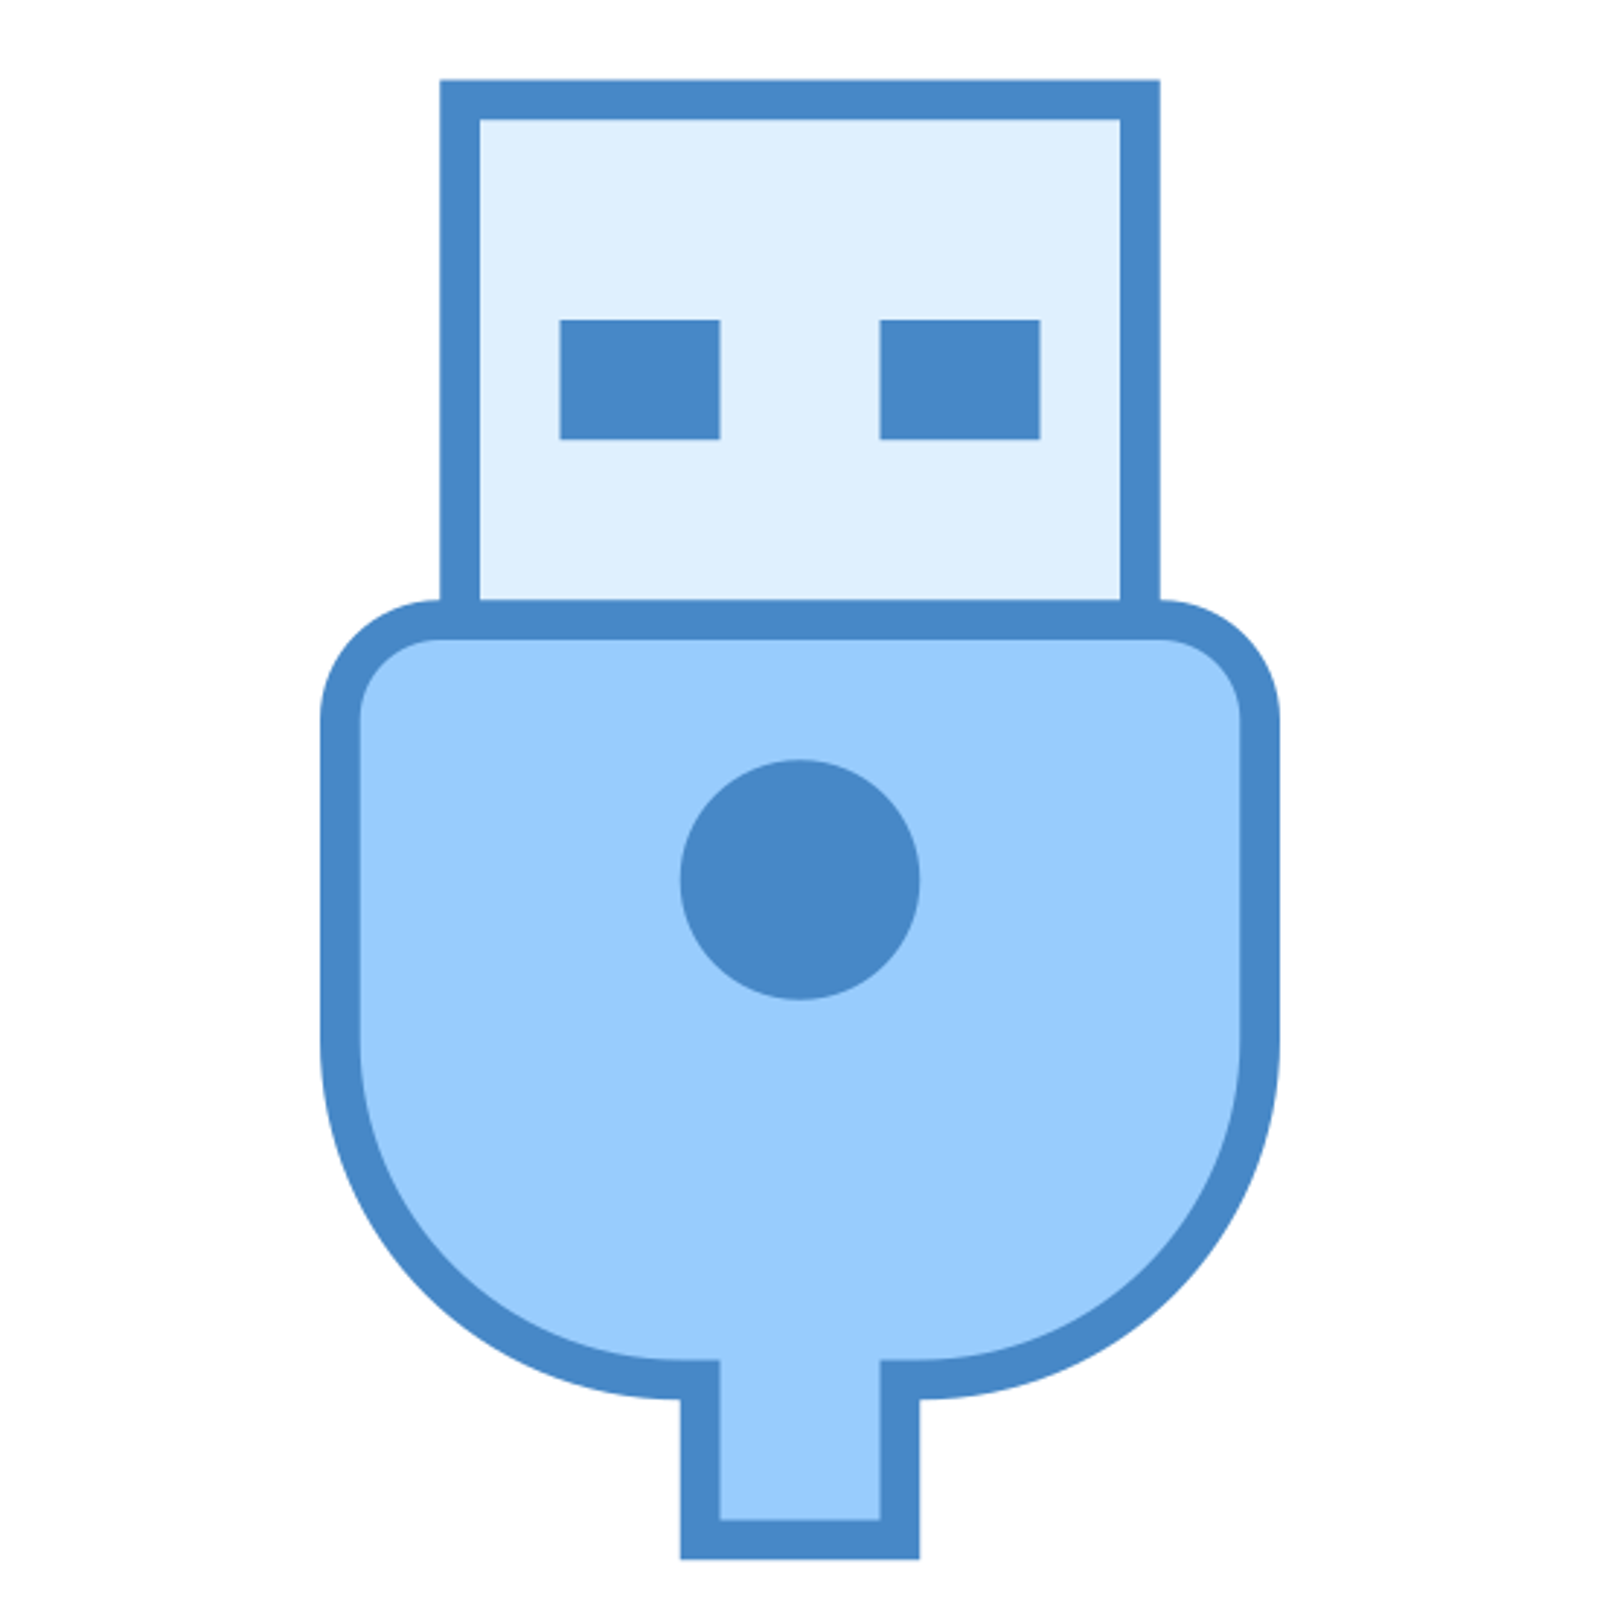 USB nieaktywne icon